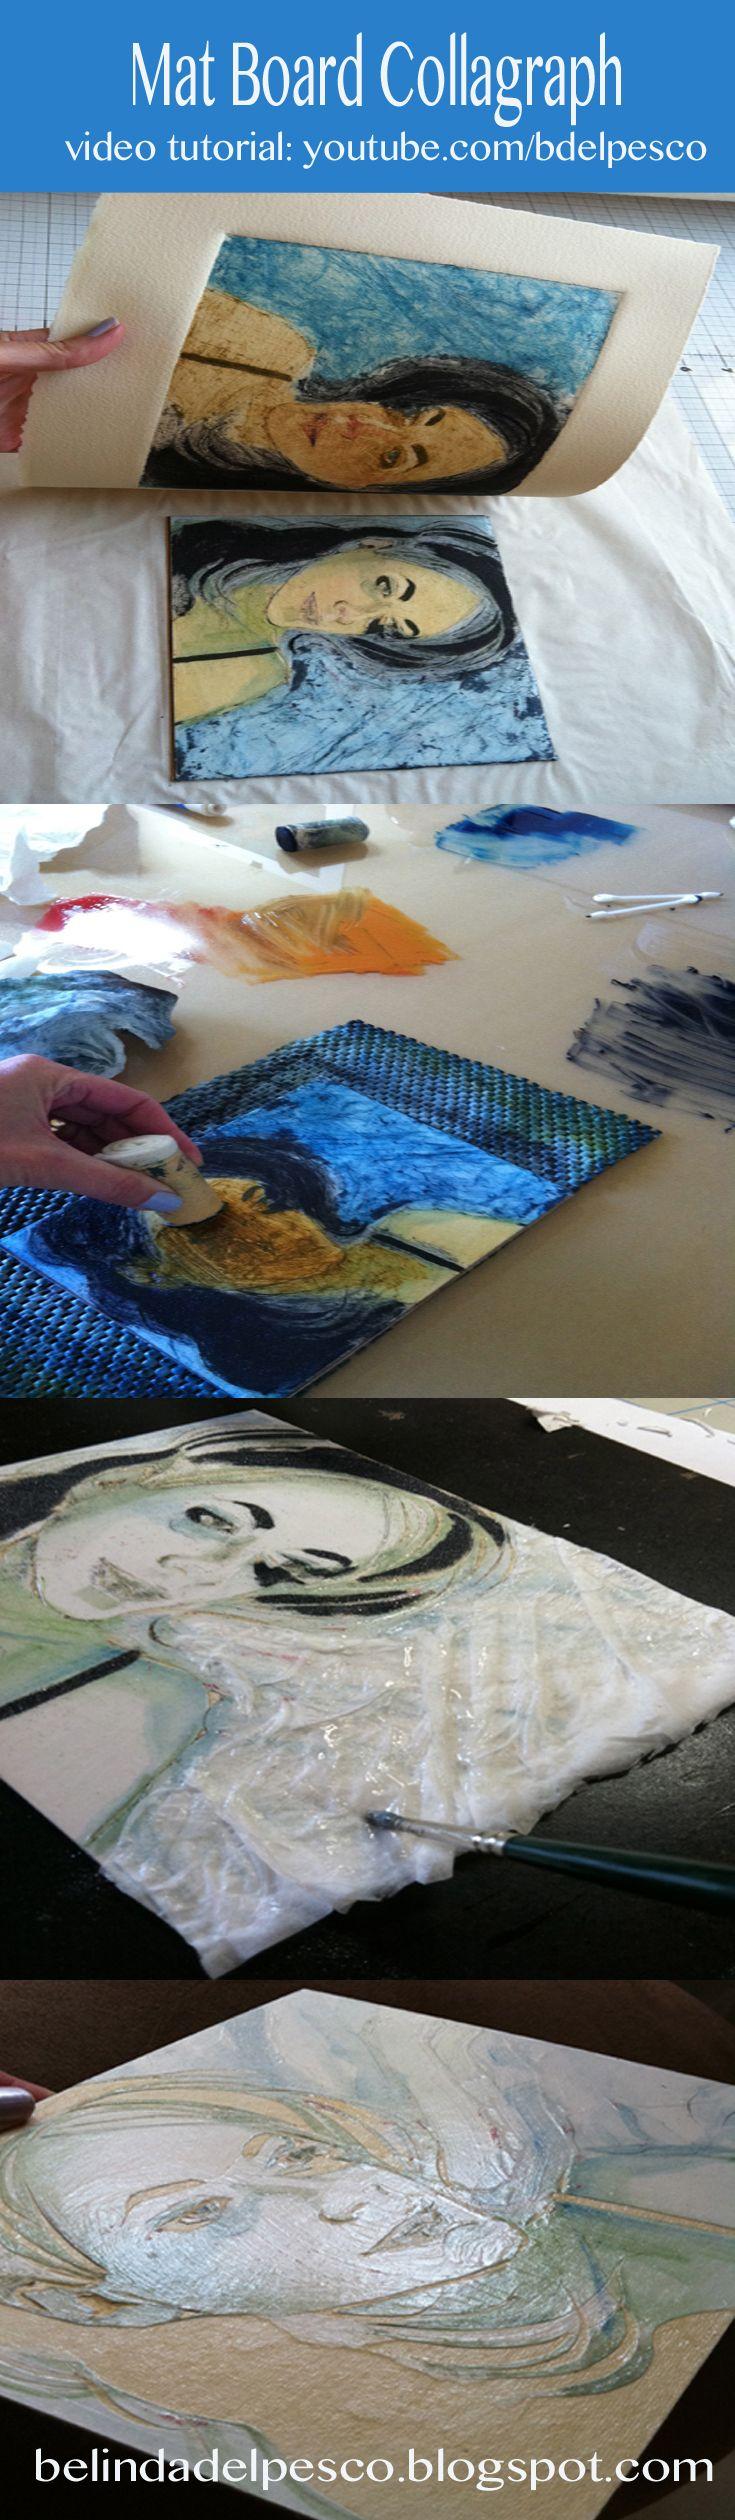 Artist Belinda Del Pesco tutorial ijvideos on several printmaking techniques.